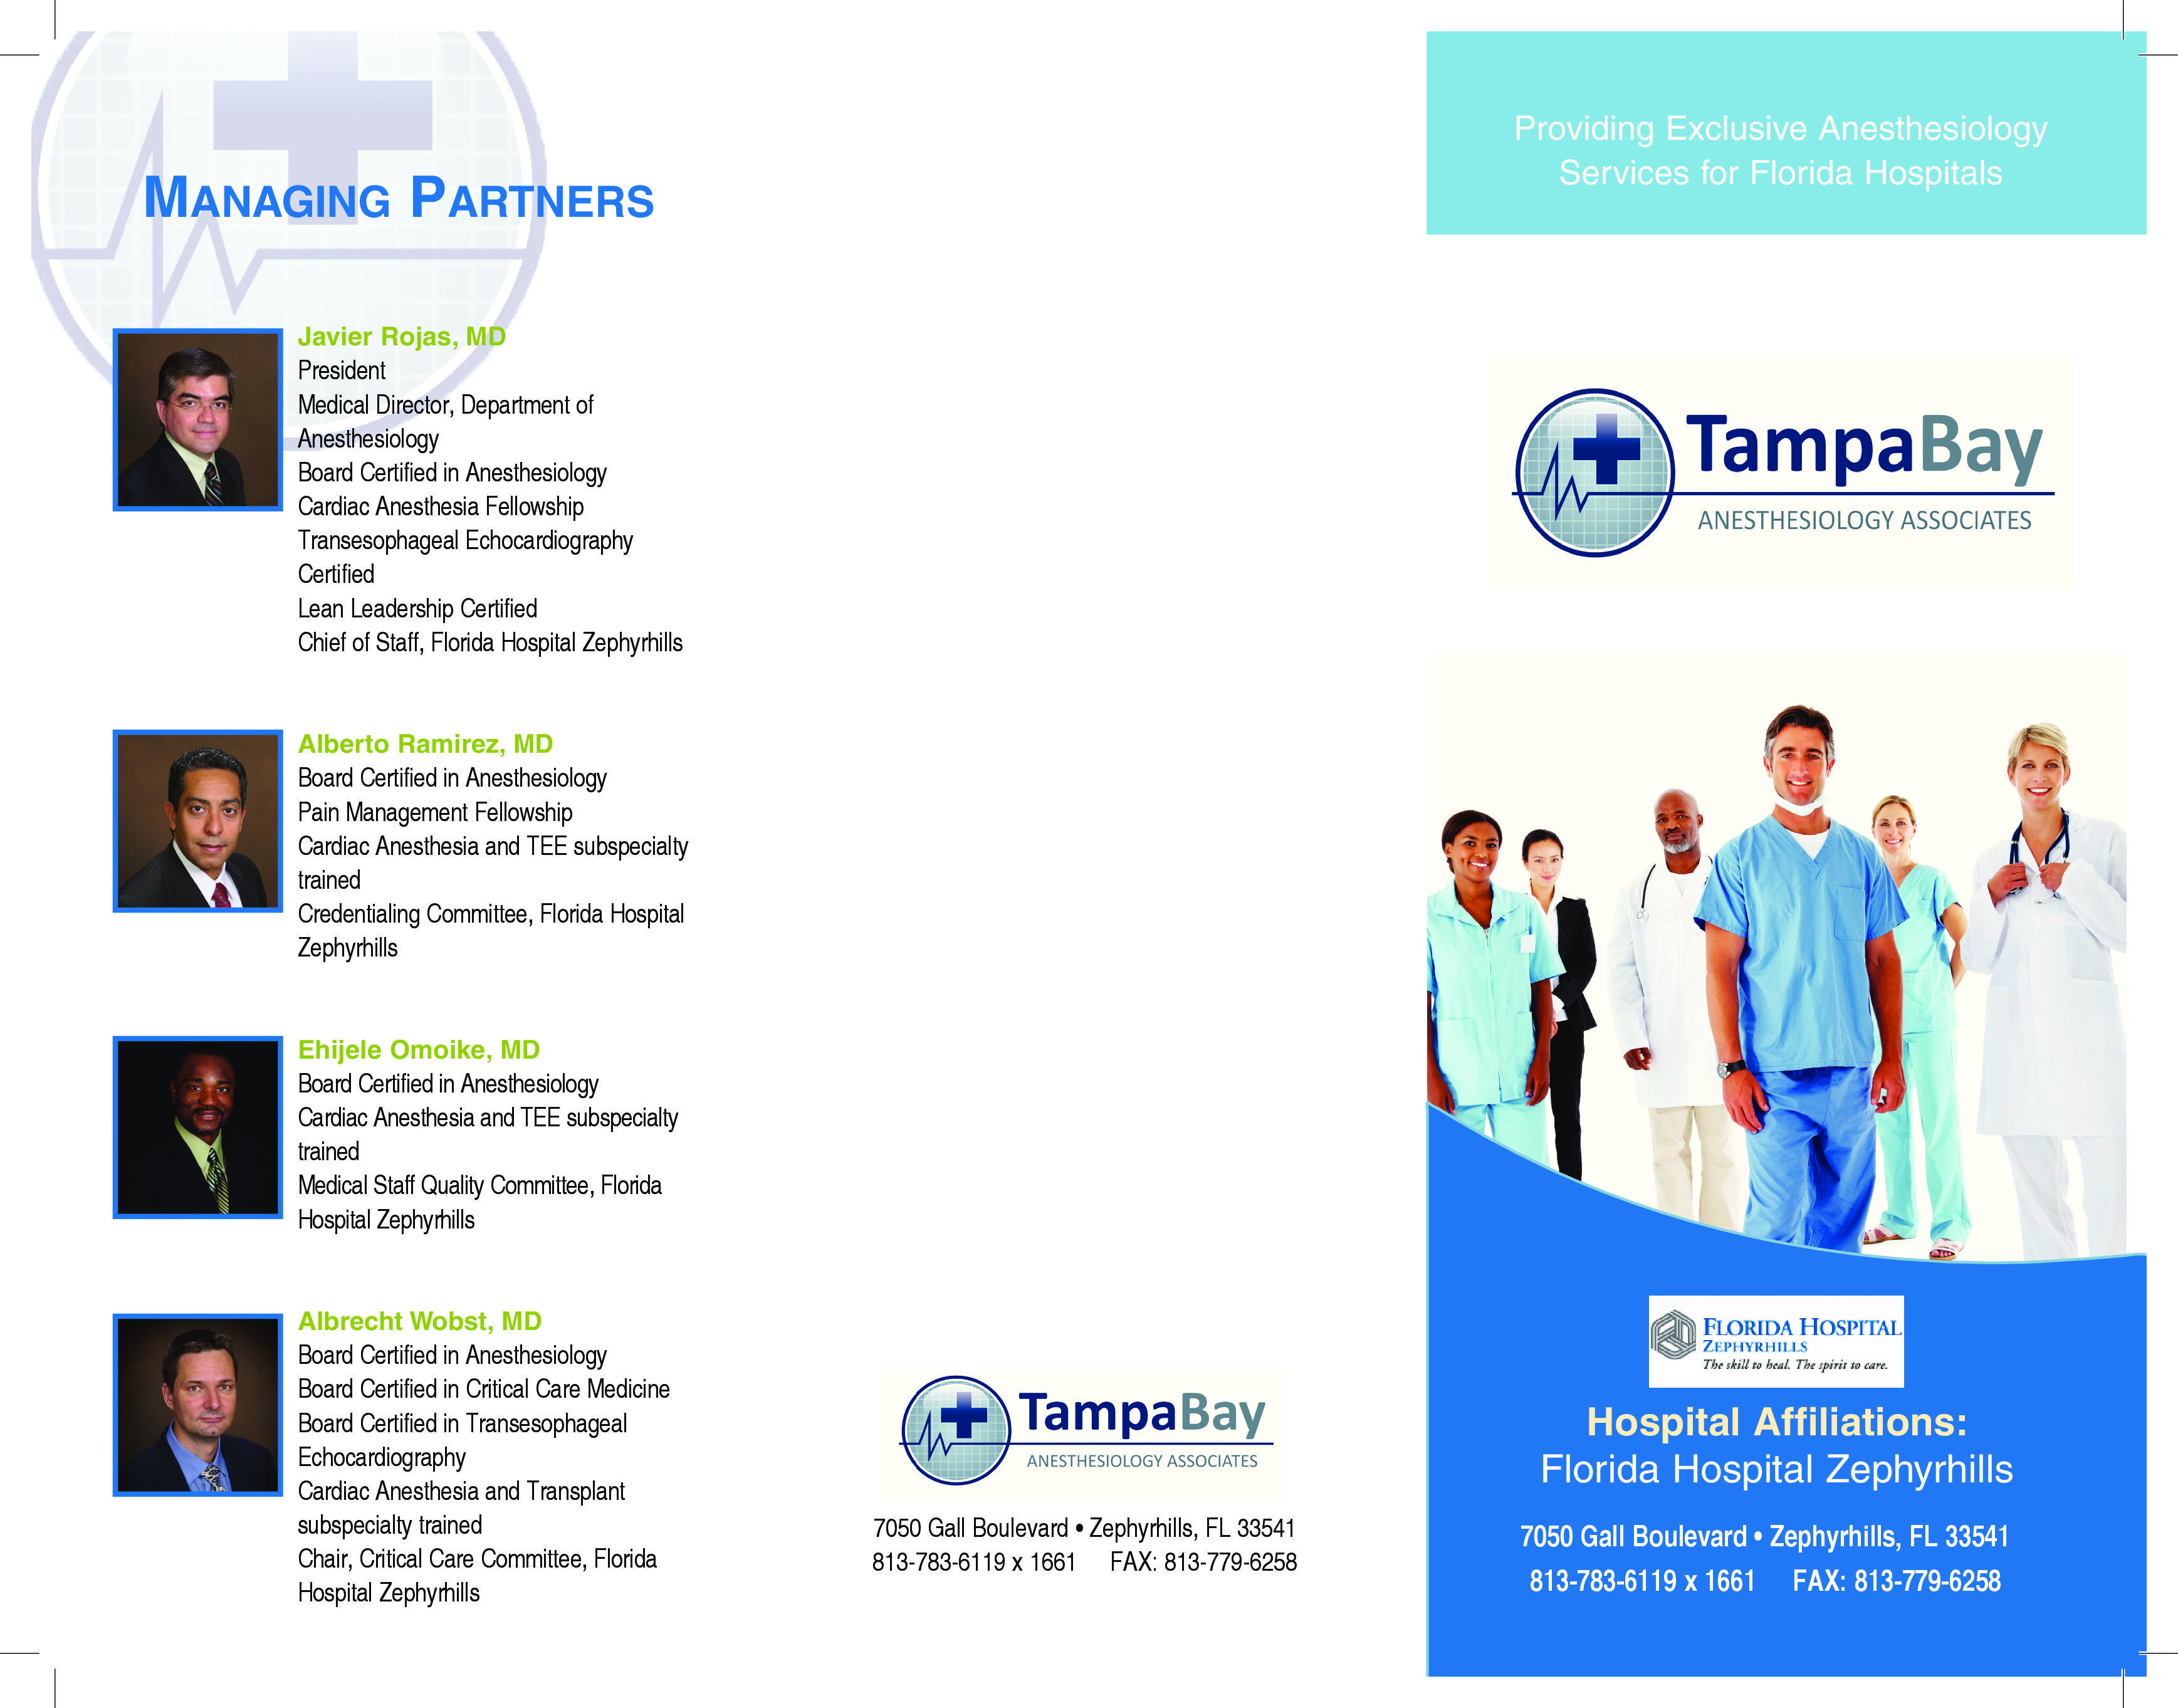 Tampa Bay Anesthesiology Bayshore Marketing Group Dental Marketing Group Work Anesthesiology